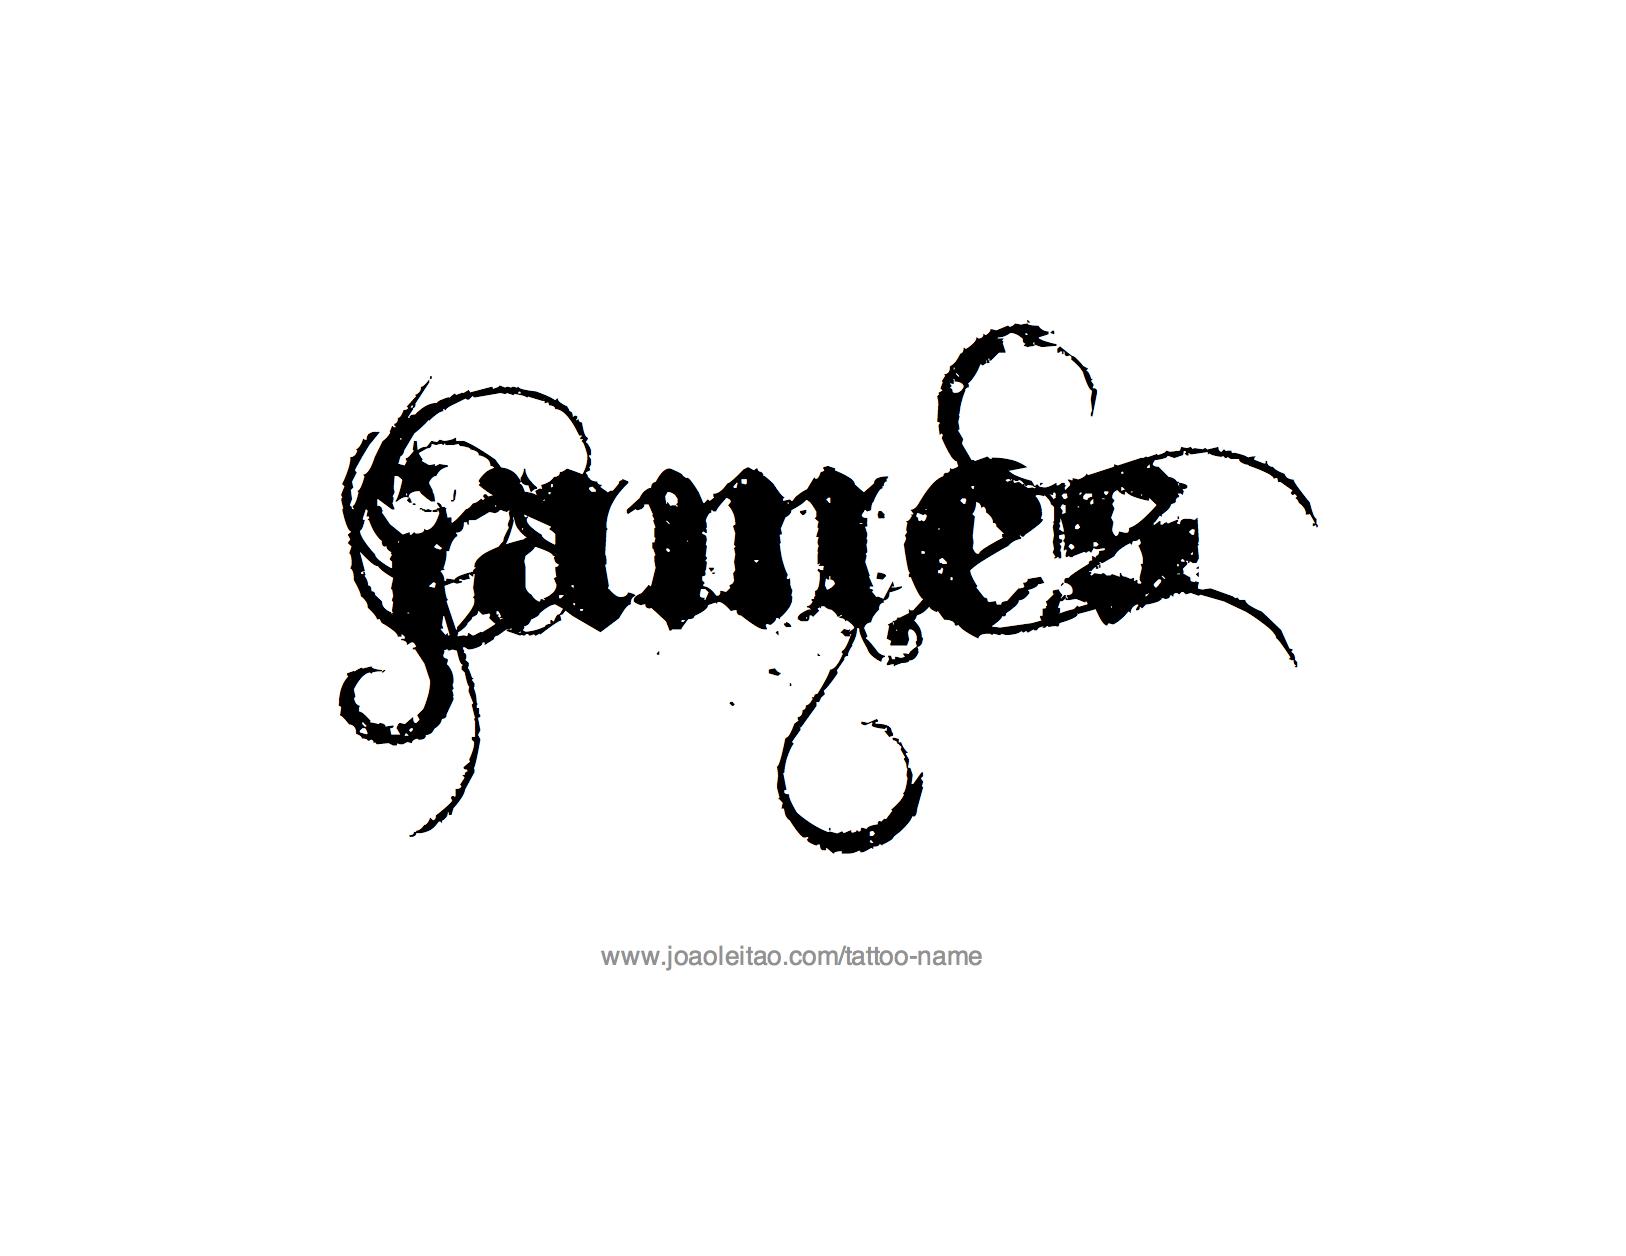 james name tattoo designs